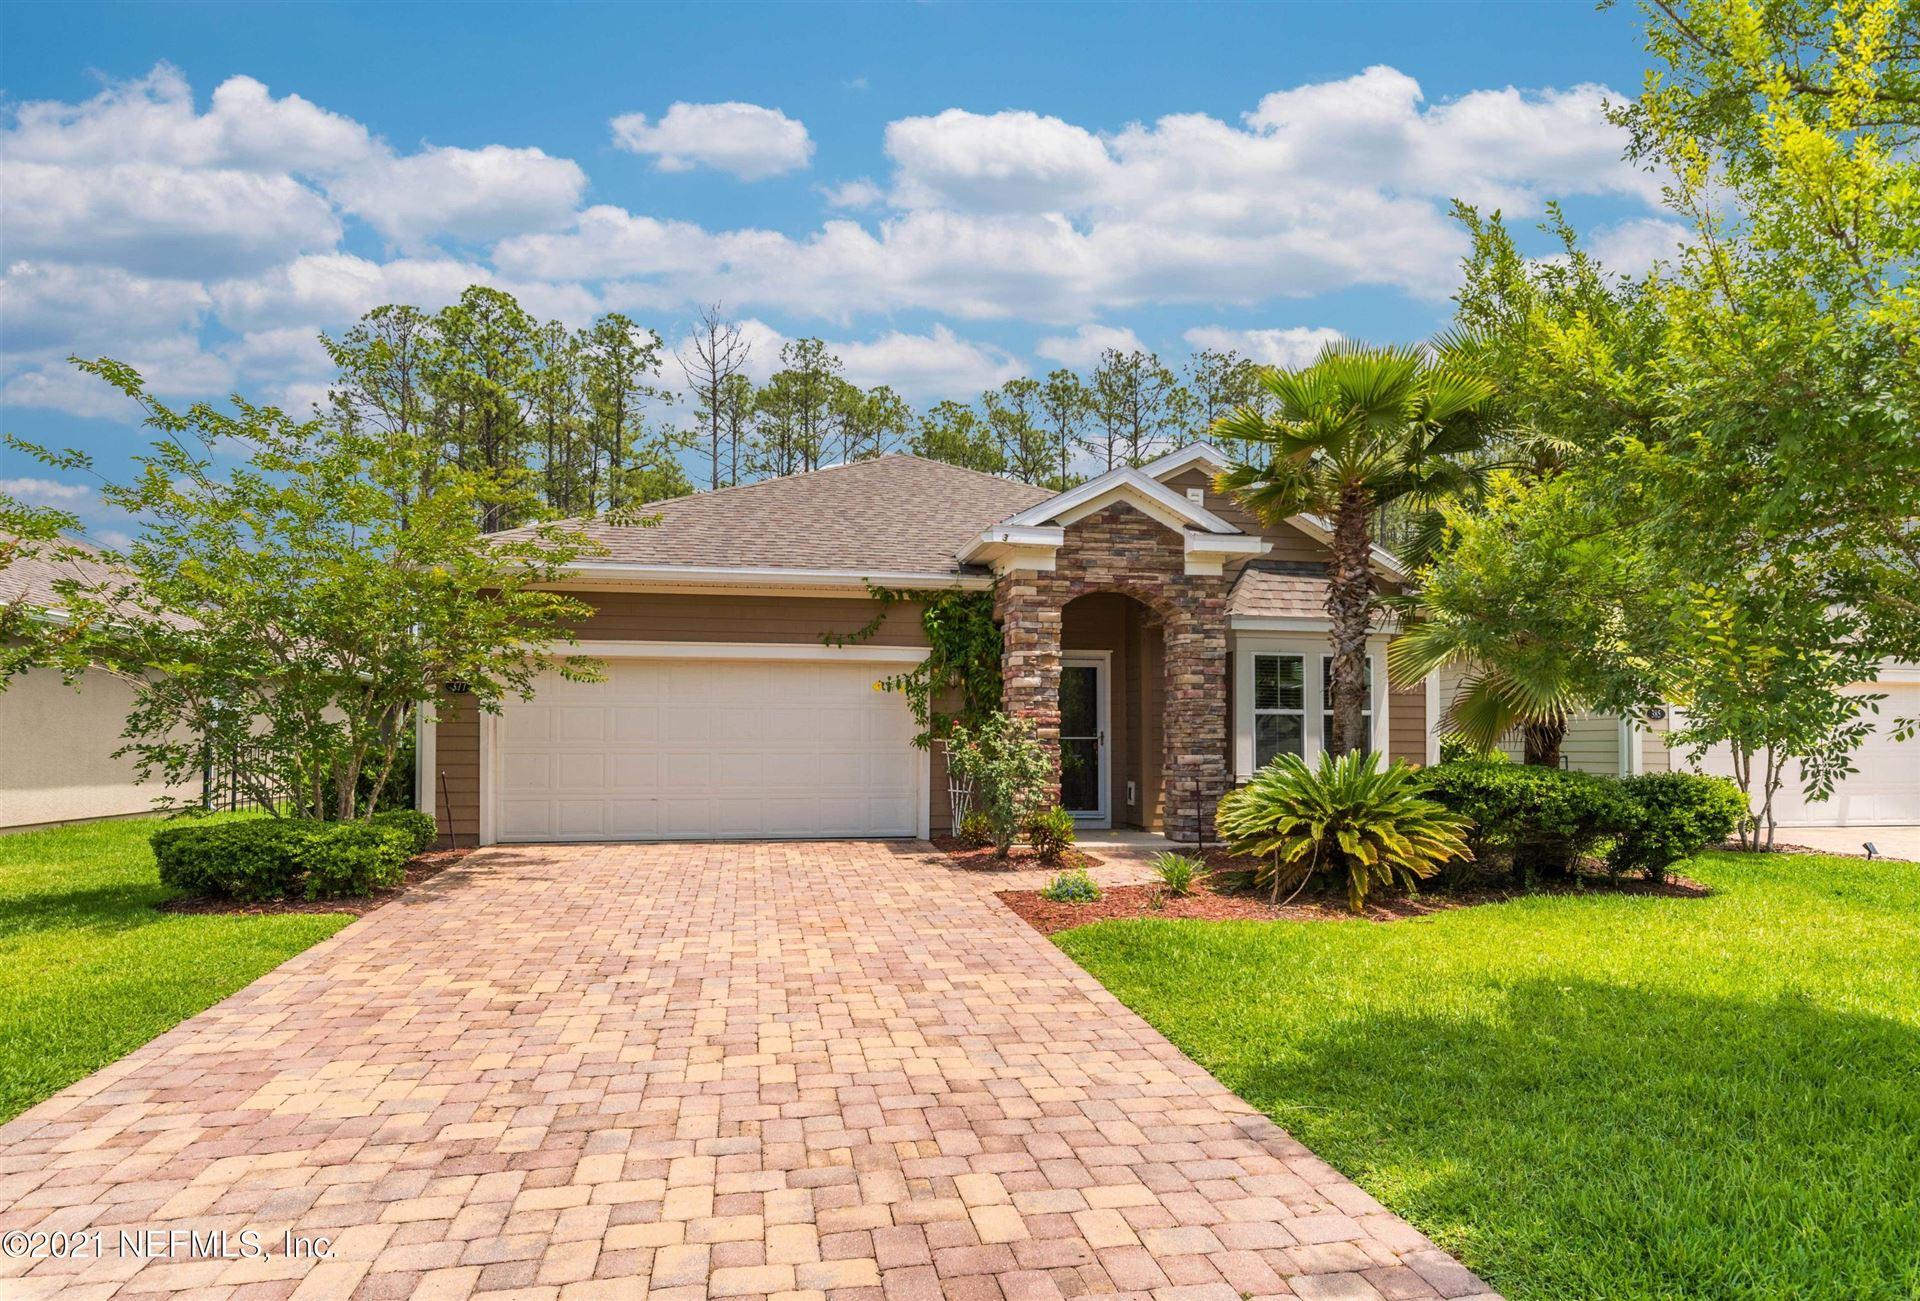 377 ASPEN LEAF DR, Jacksonville, FL 32081 - MLS#: 1108036